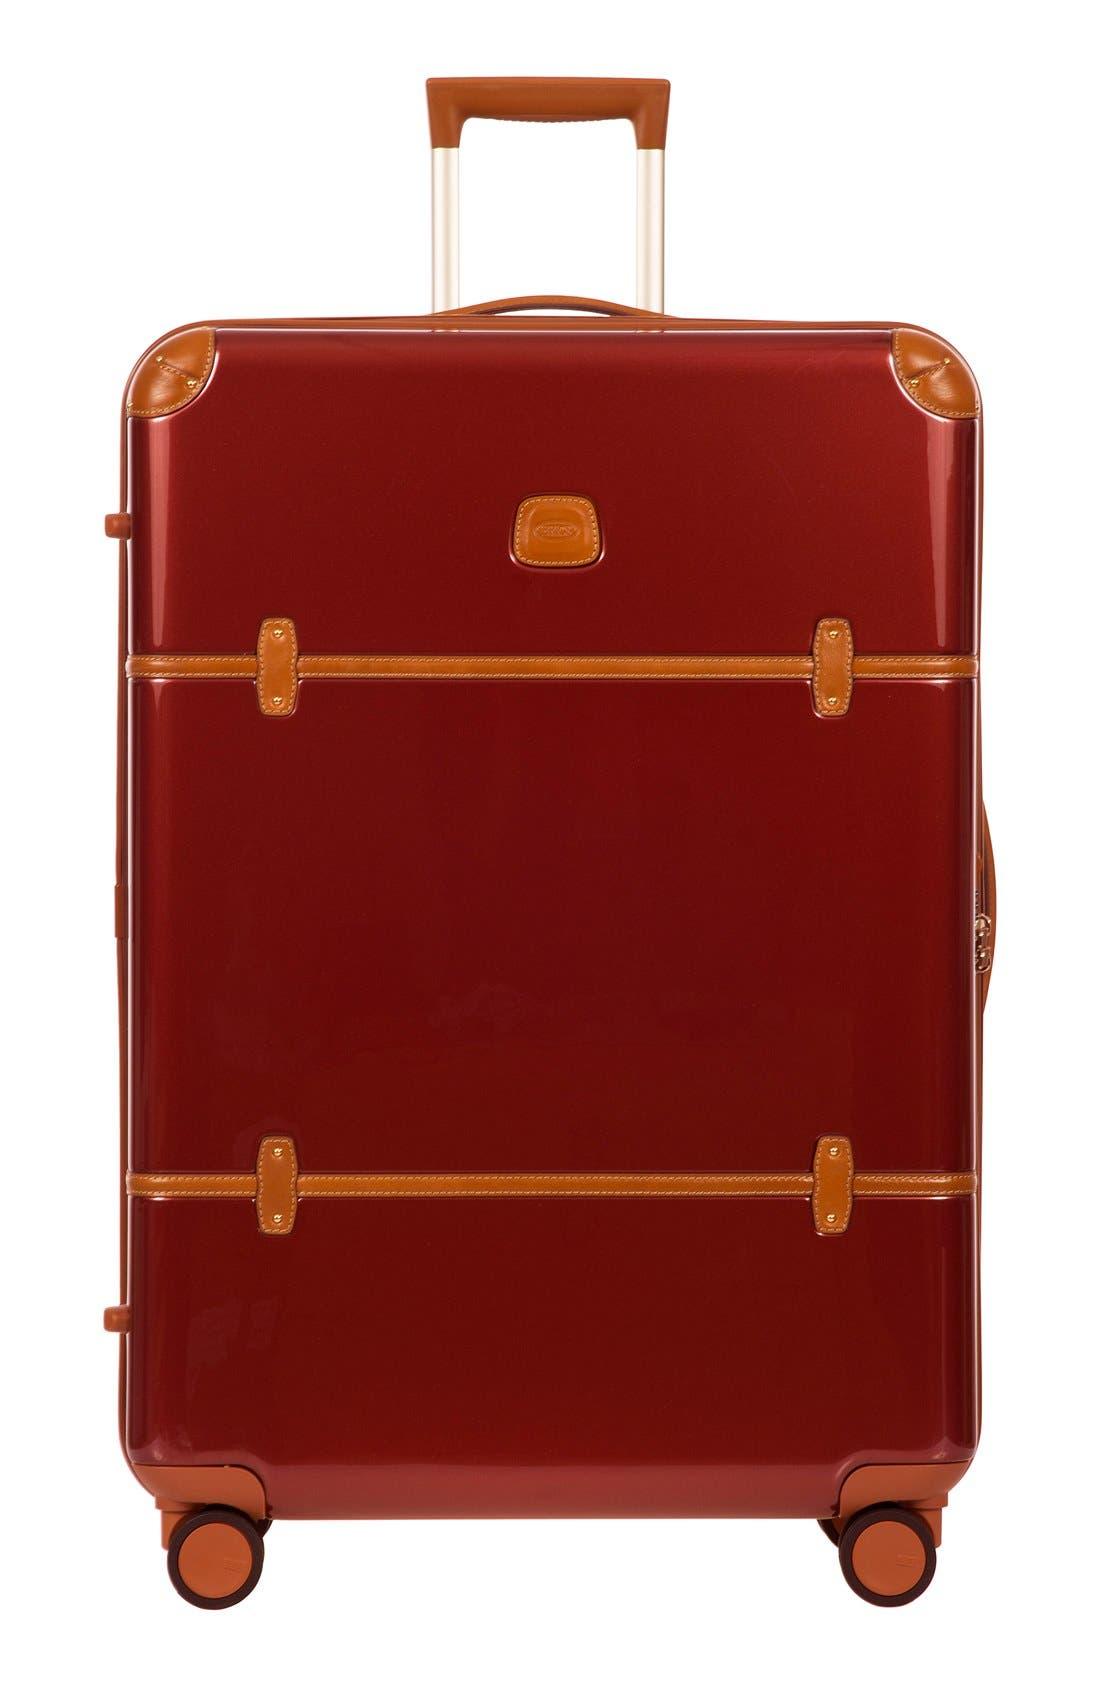 BRICS Bellagio 2.0 32 Inch Rolling Spinner Suitcase